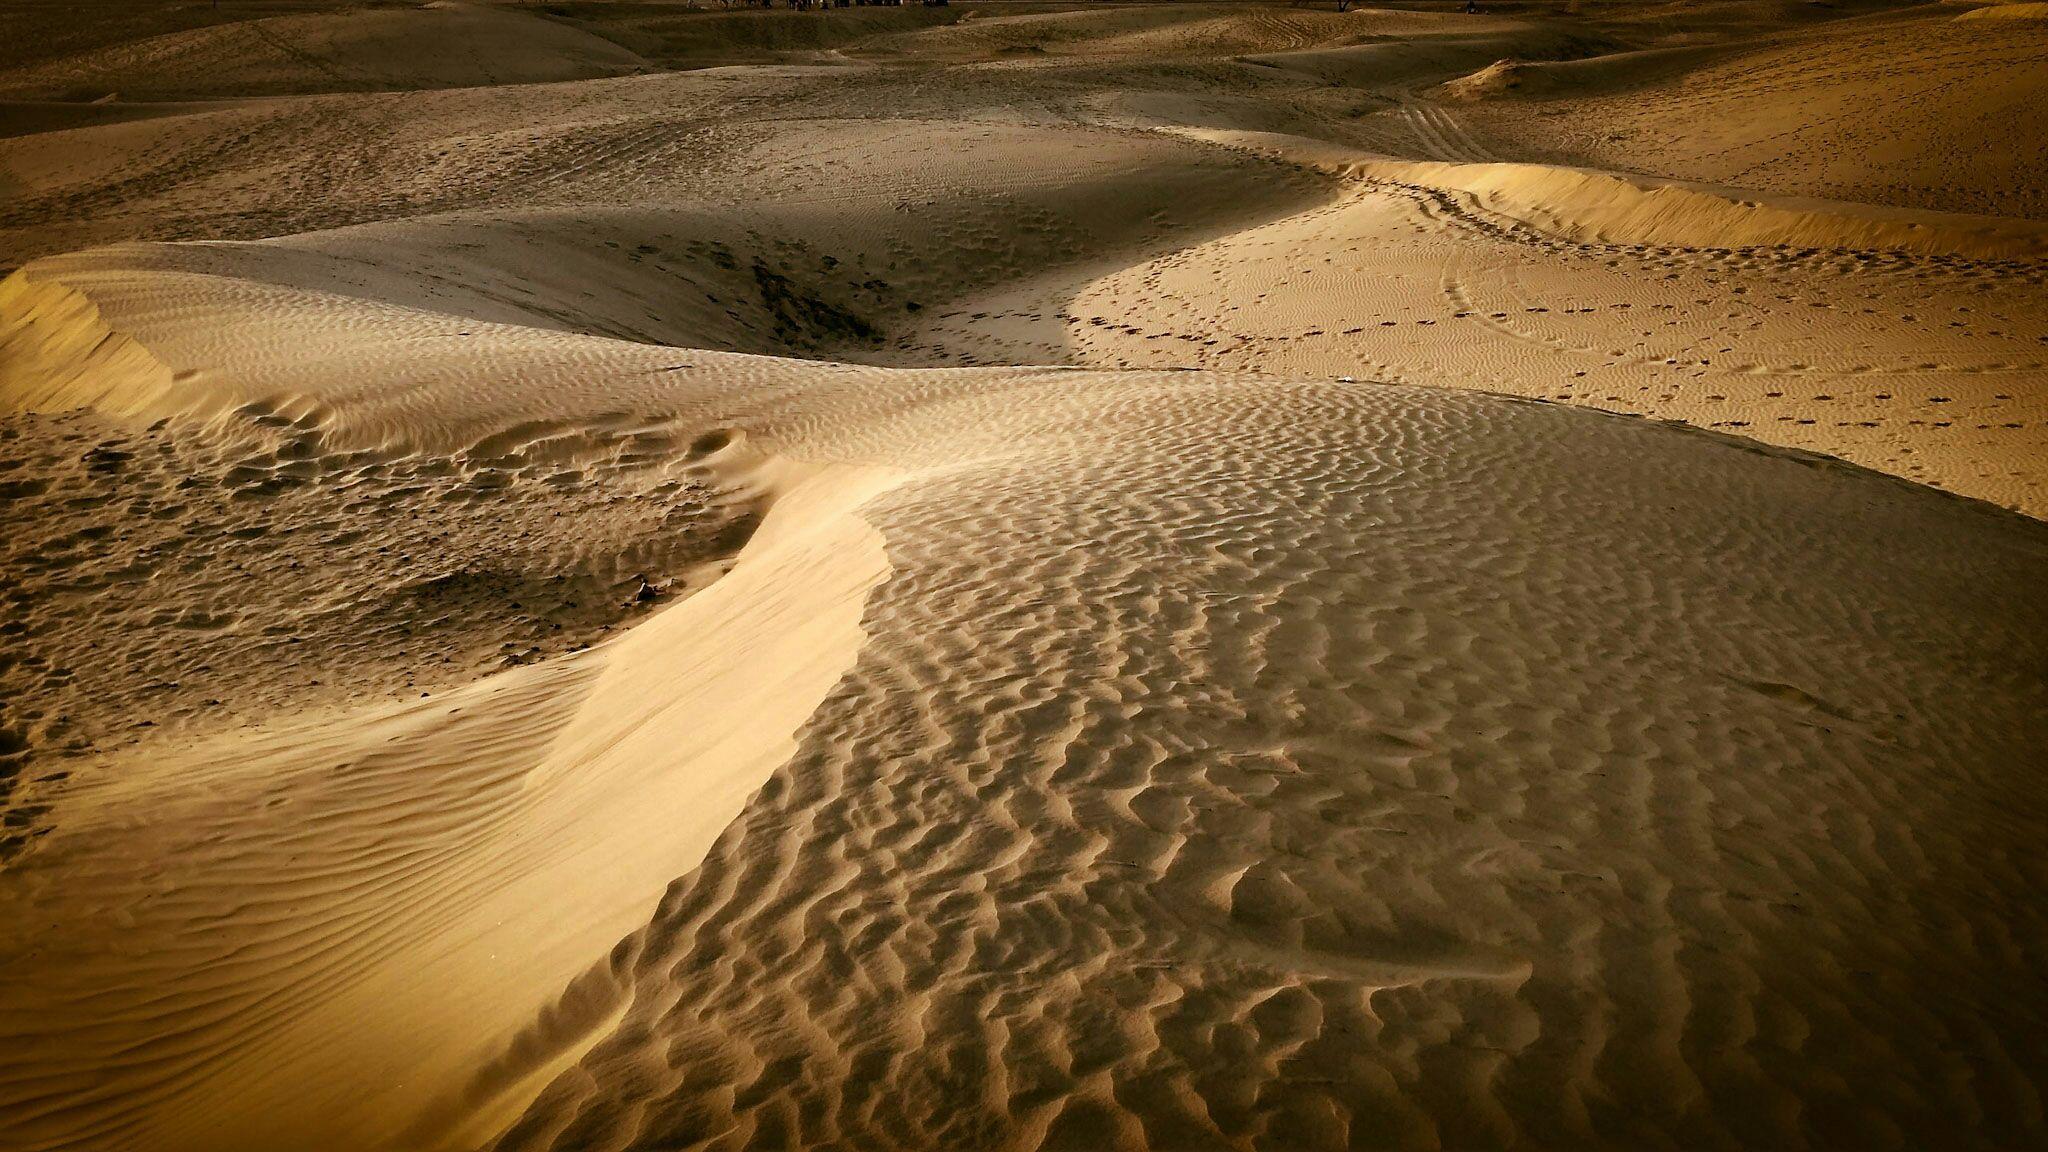 Thar Desert. #travel #traveler #travelphotography #sand #sanddunes #india #rajasthan #outdoor #nature #landscape #nolife #landscapephotography #